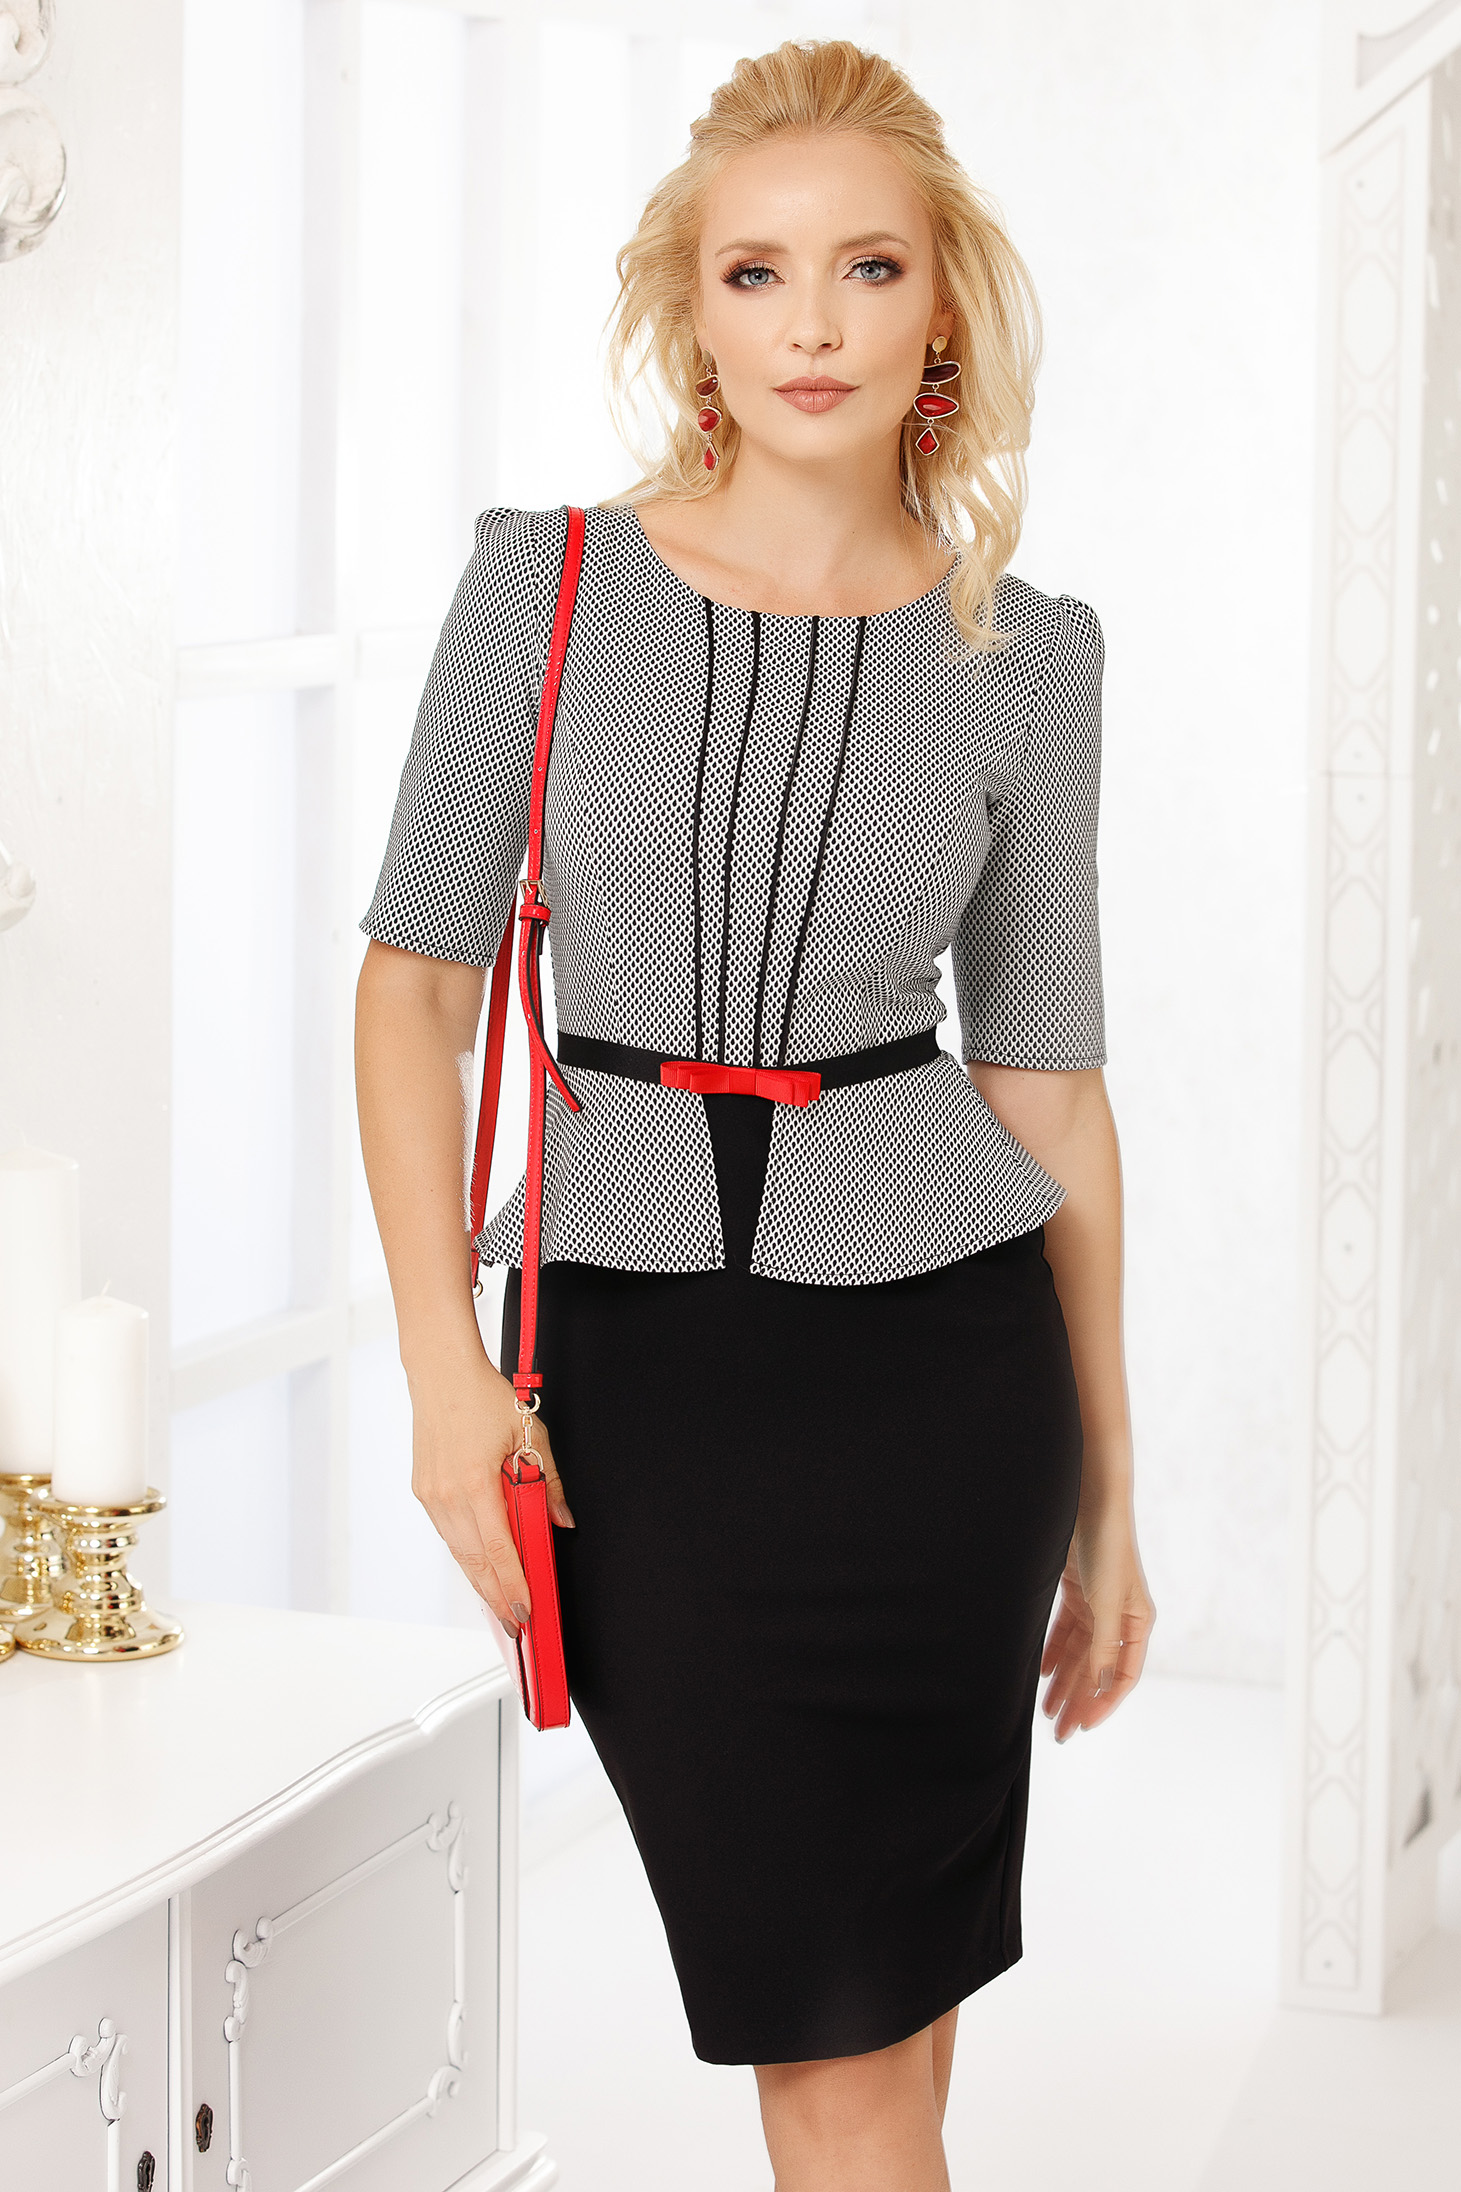 Black short cut elegant pencil dress with peplum and detachable cord